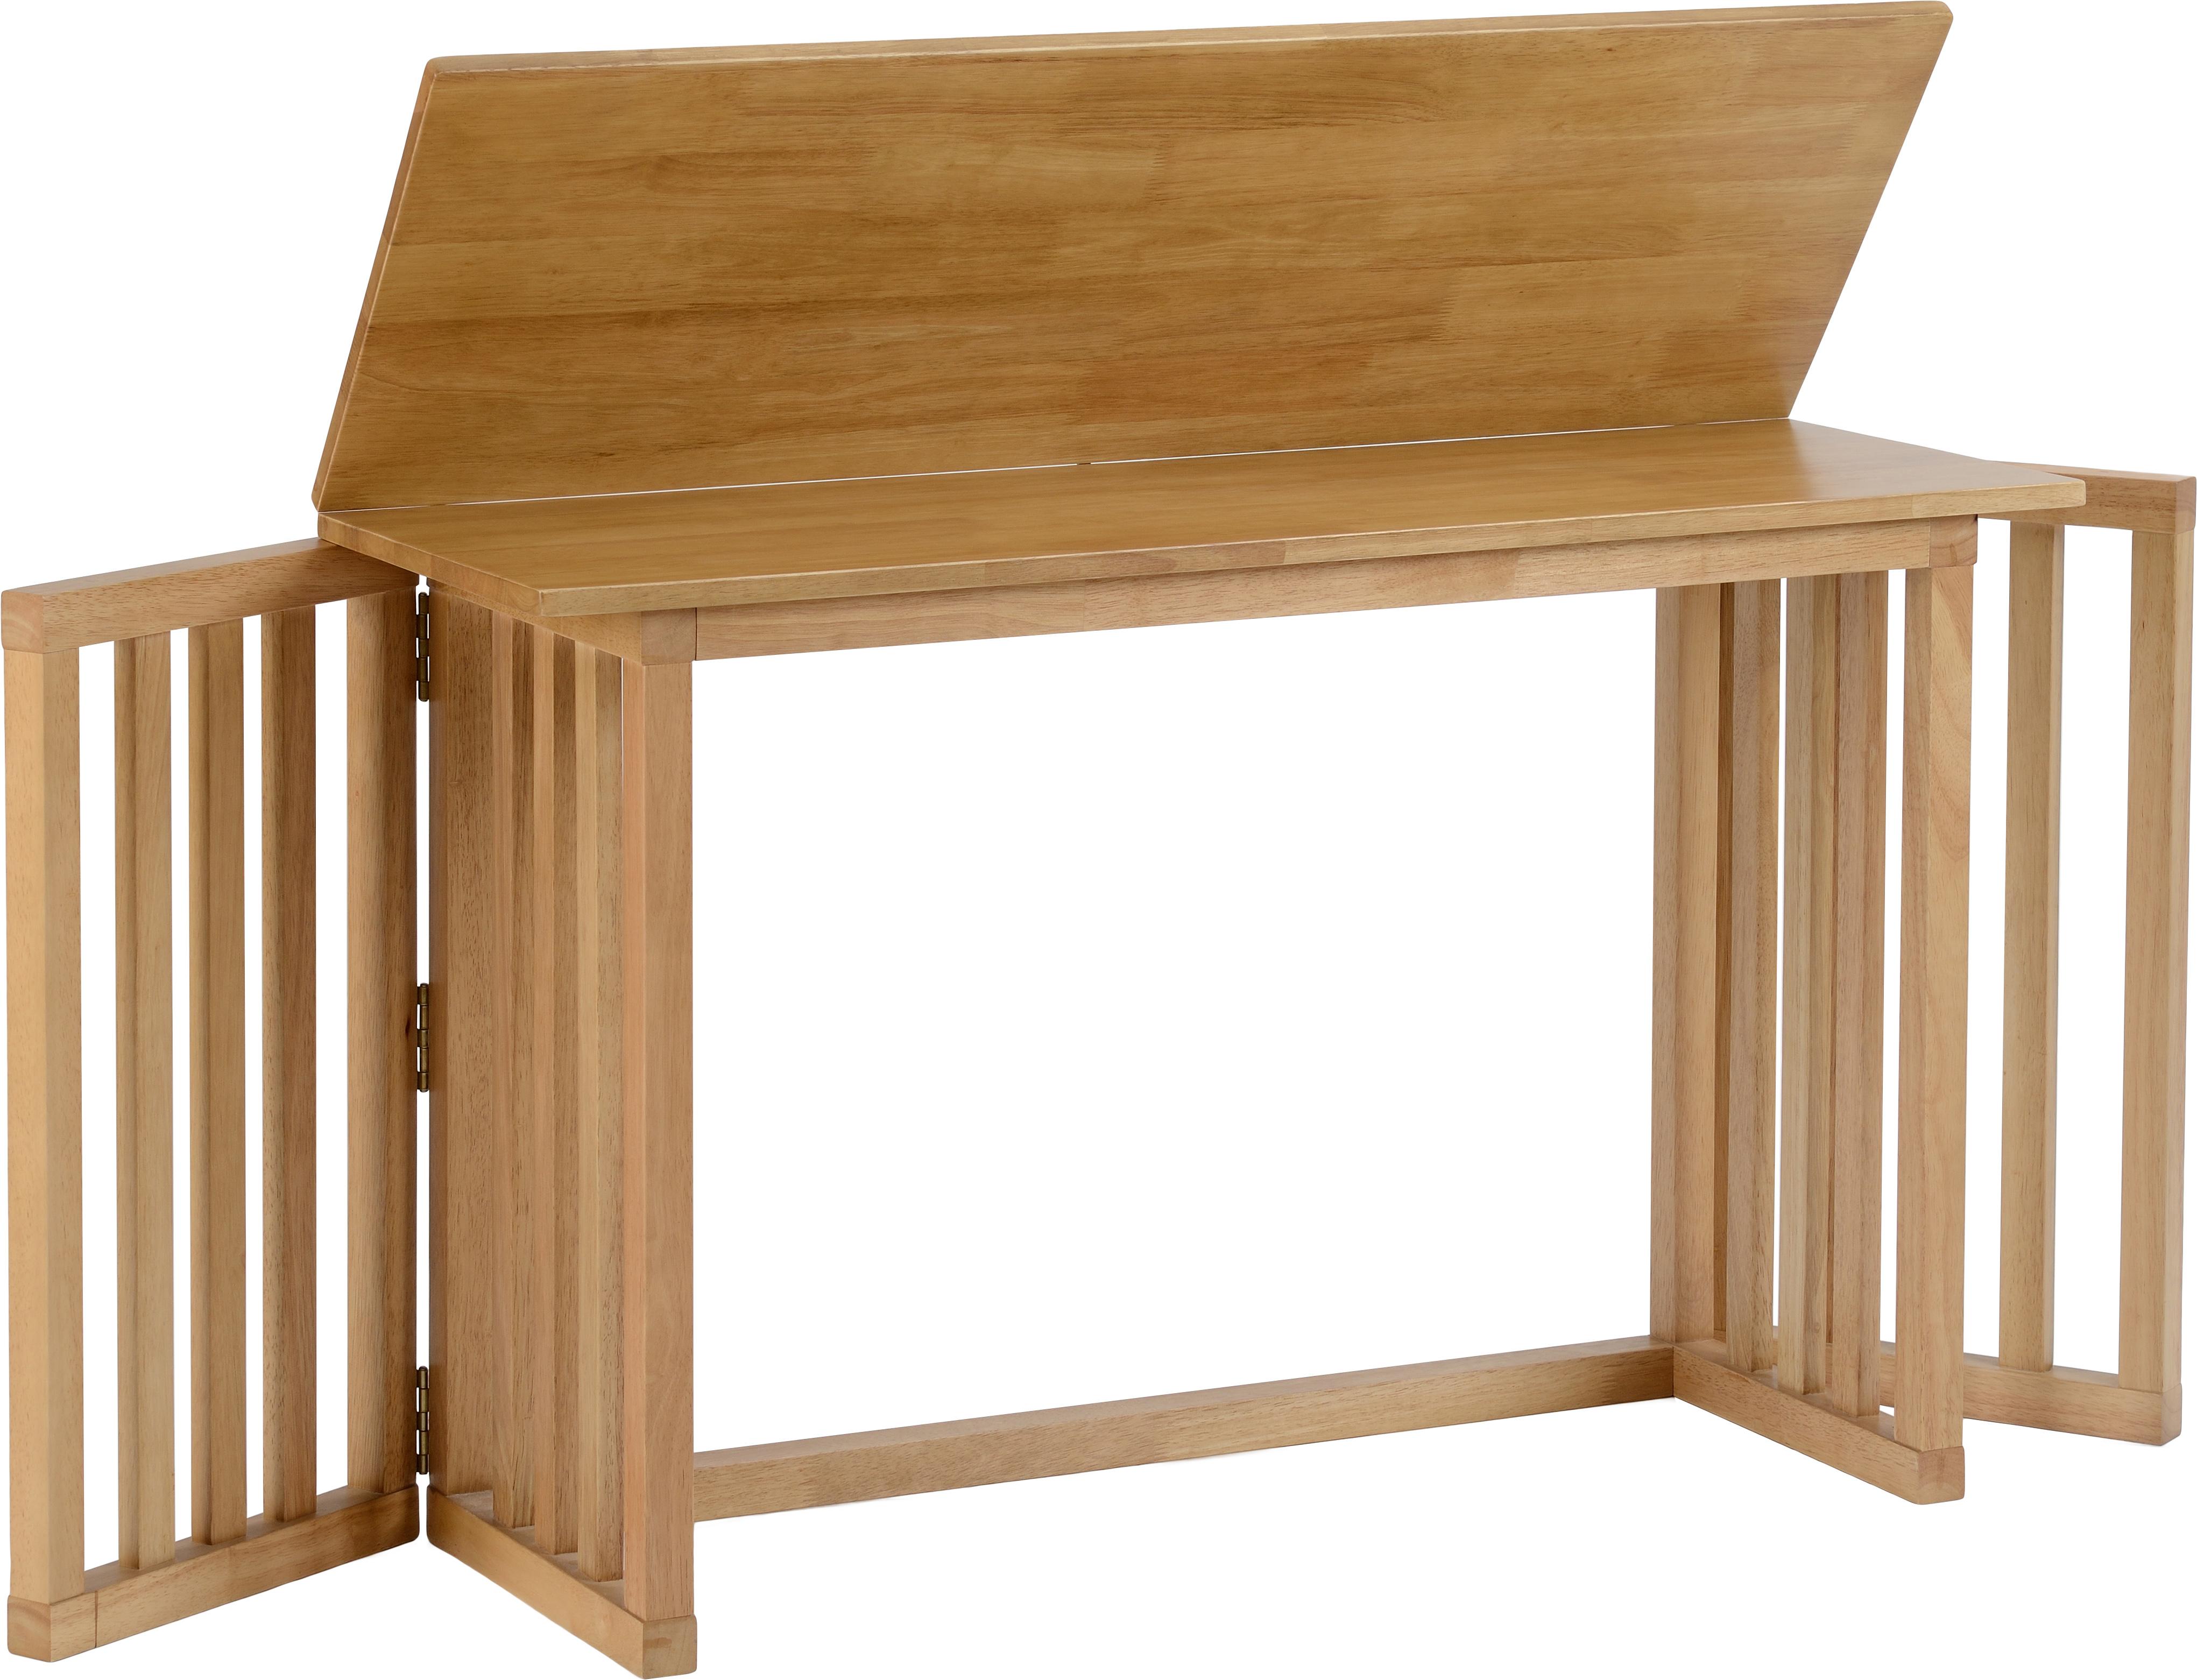 - Richmond Foldaway Dining Table In Oak Varnish - Live Well Furniture